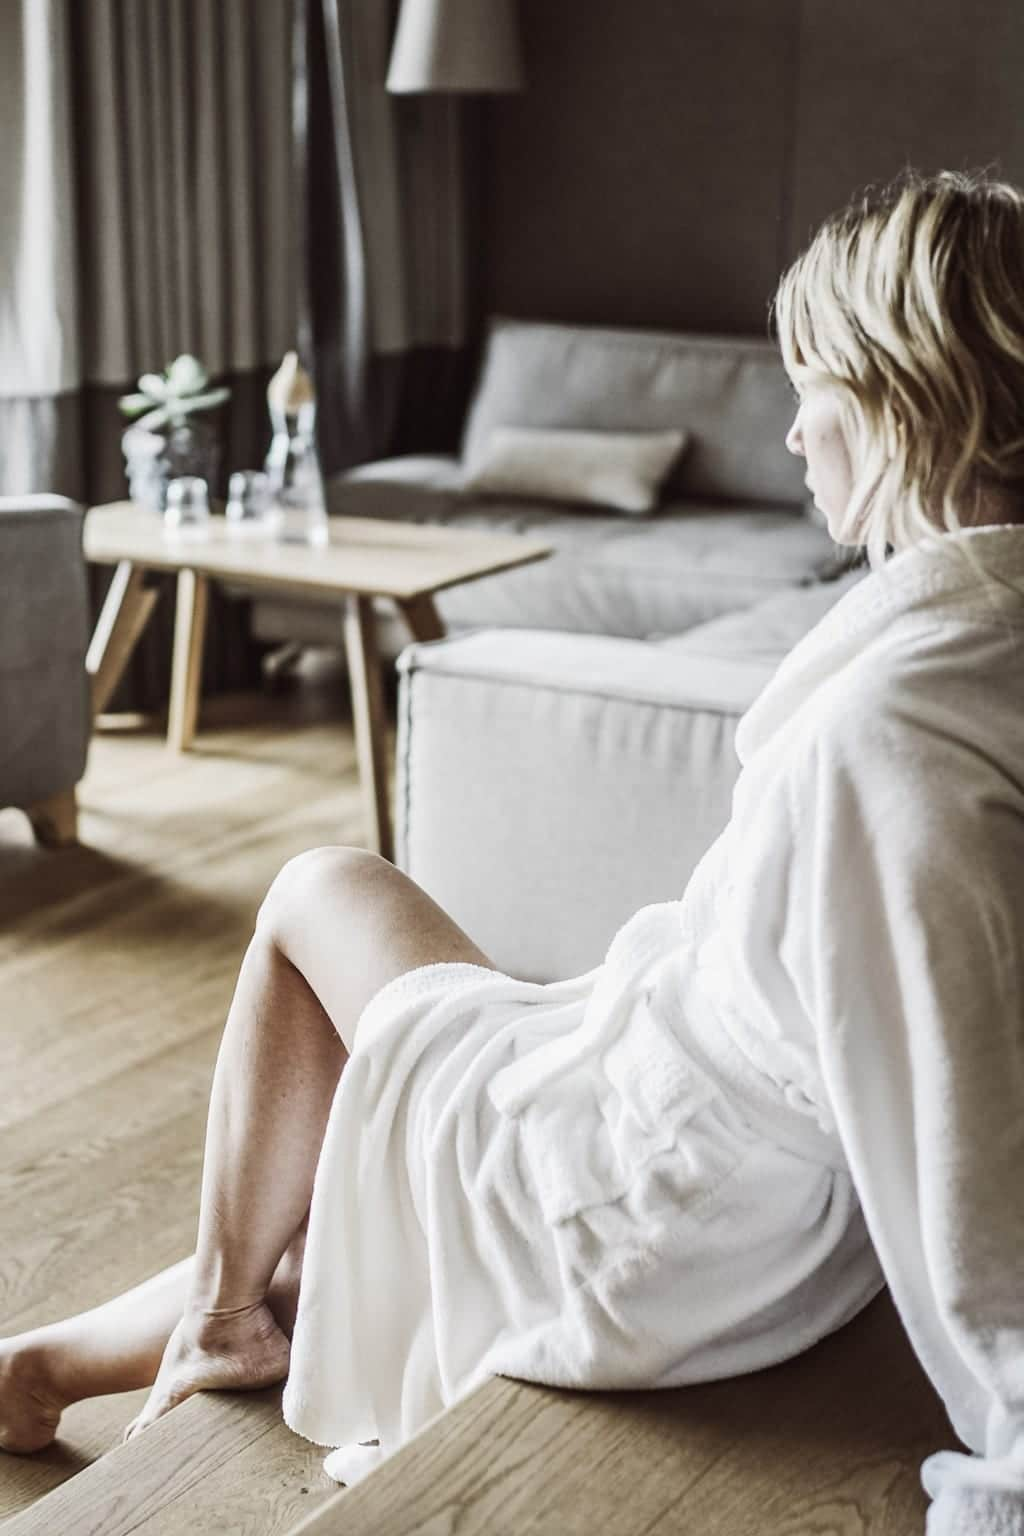 ck-constantlyk-com-karin-kaswurm-wellness-spa-hotel-gmachl-salzburg-3582